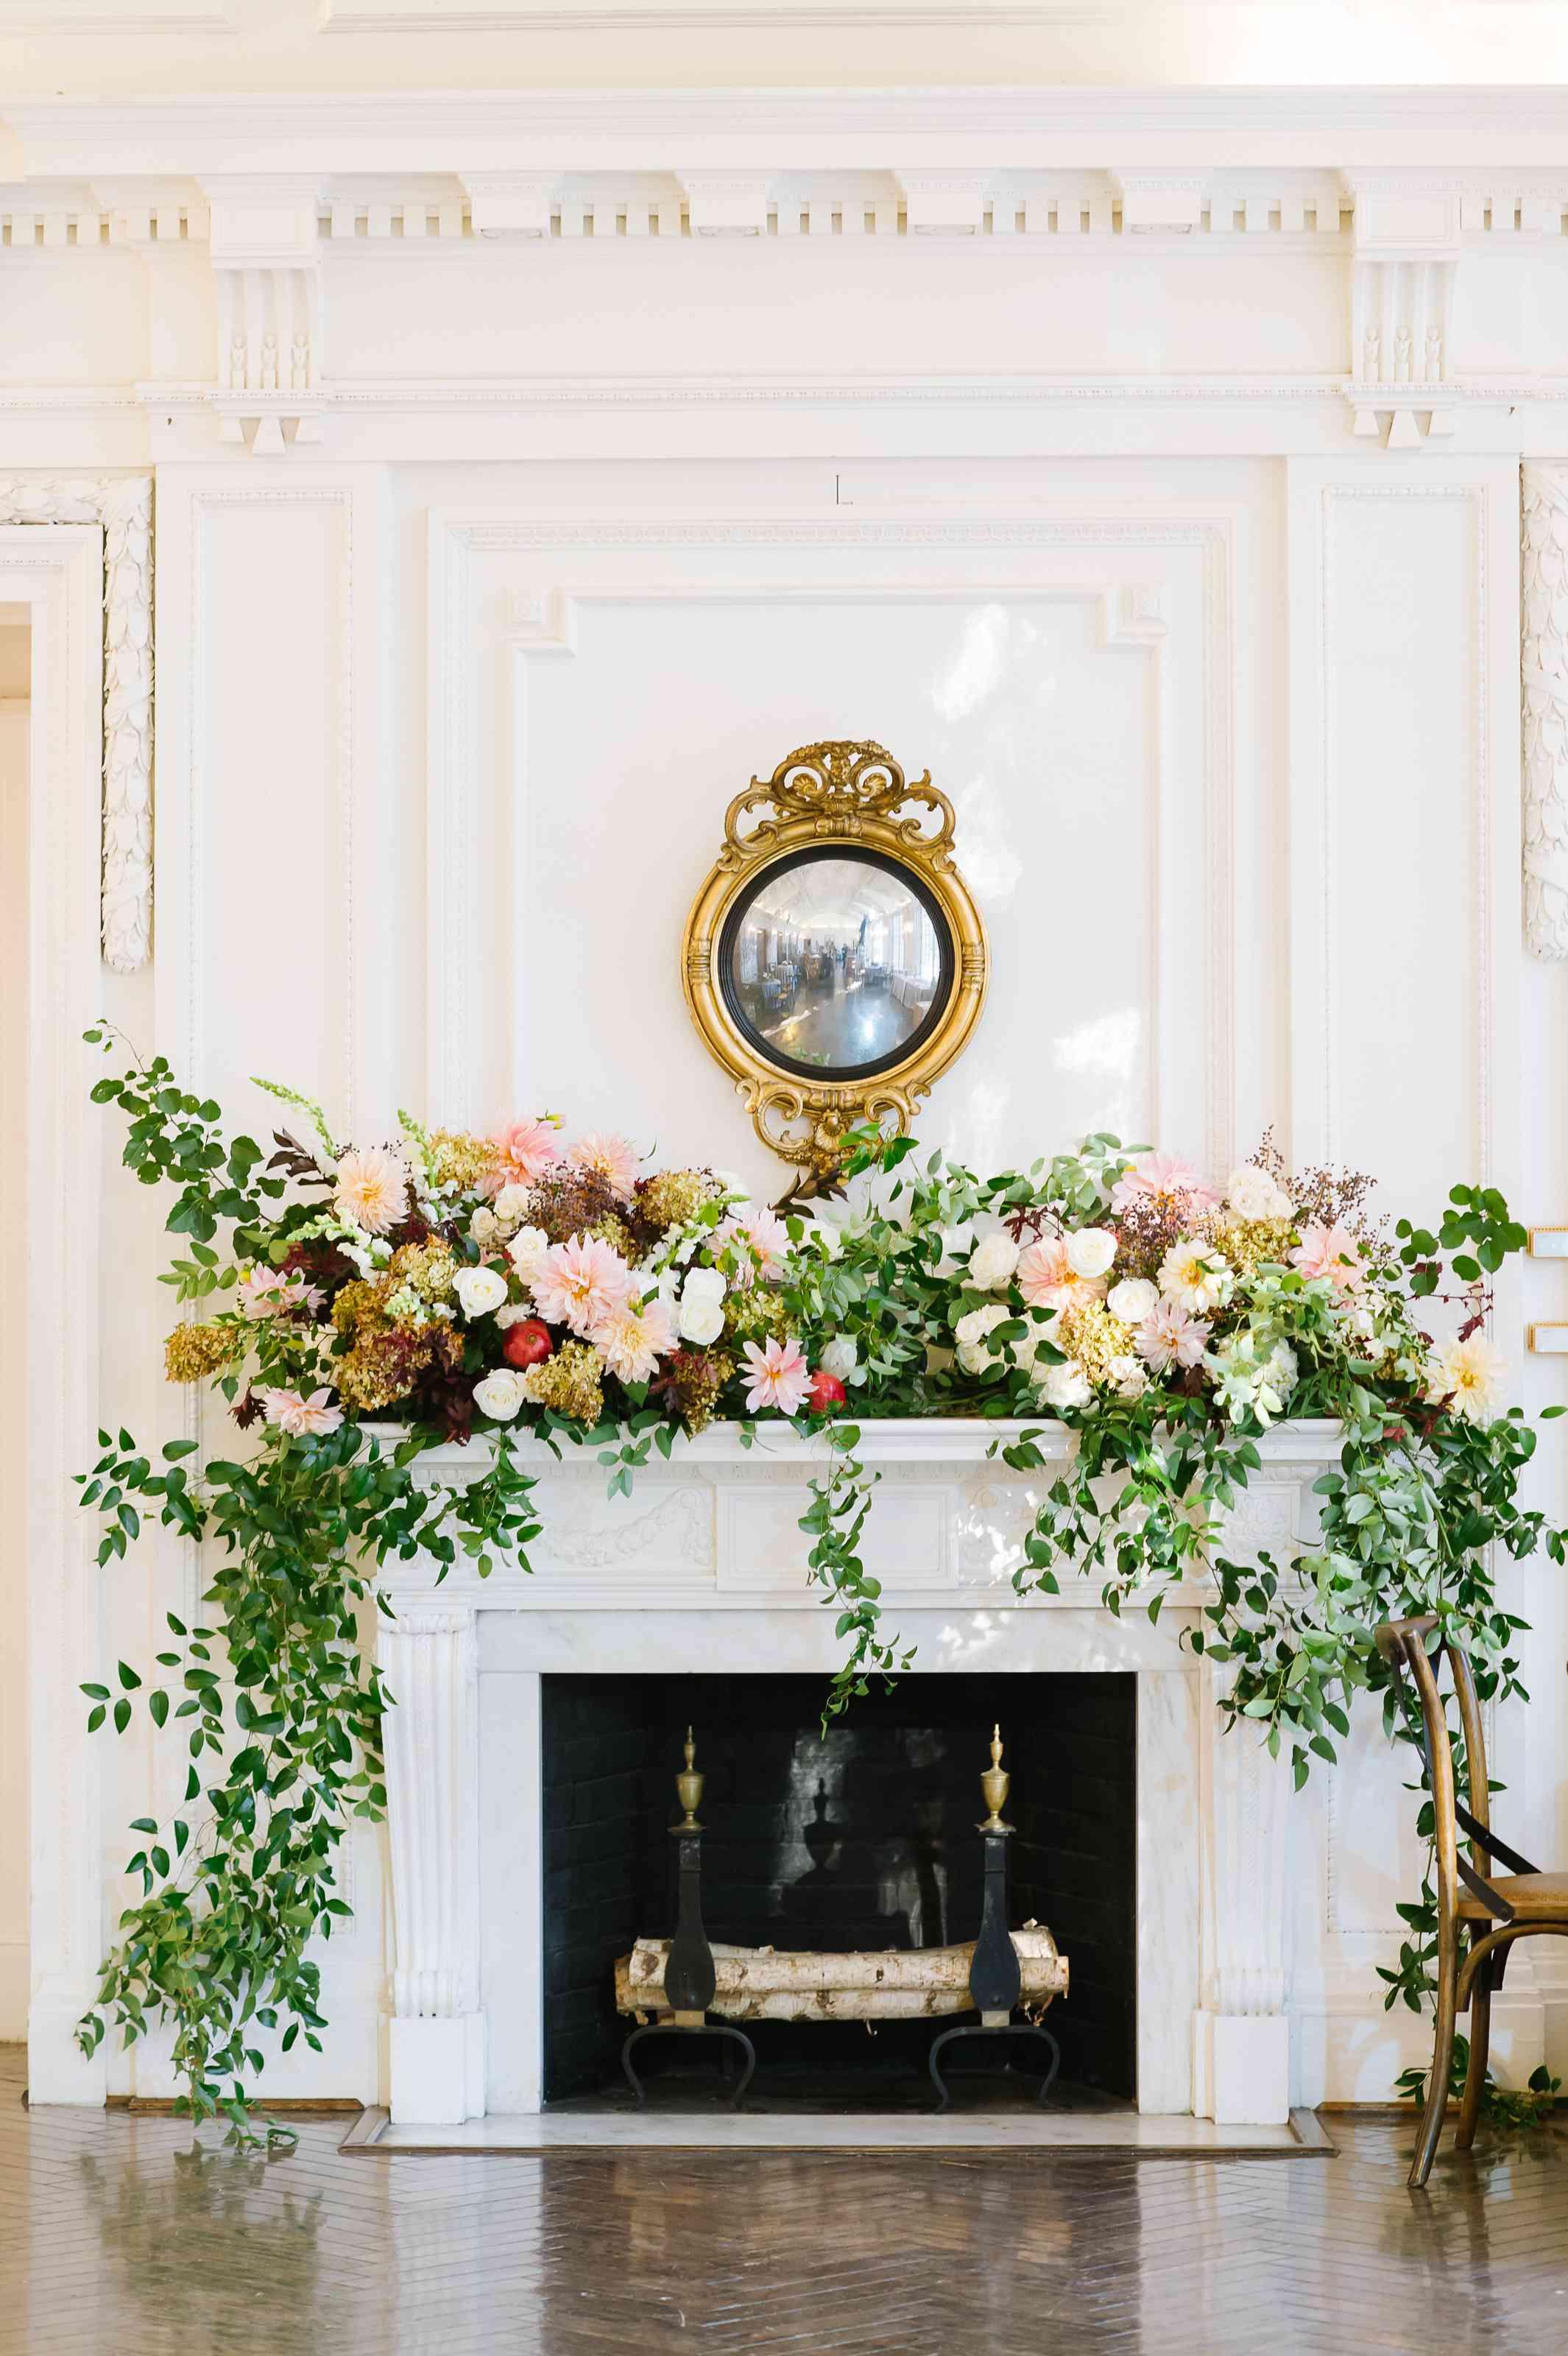 Floral arrangement on fireplace